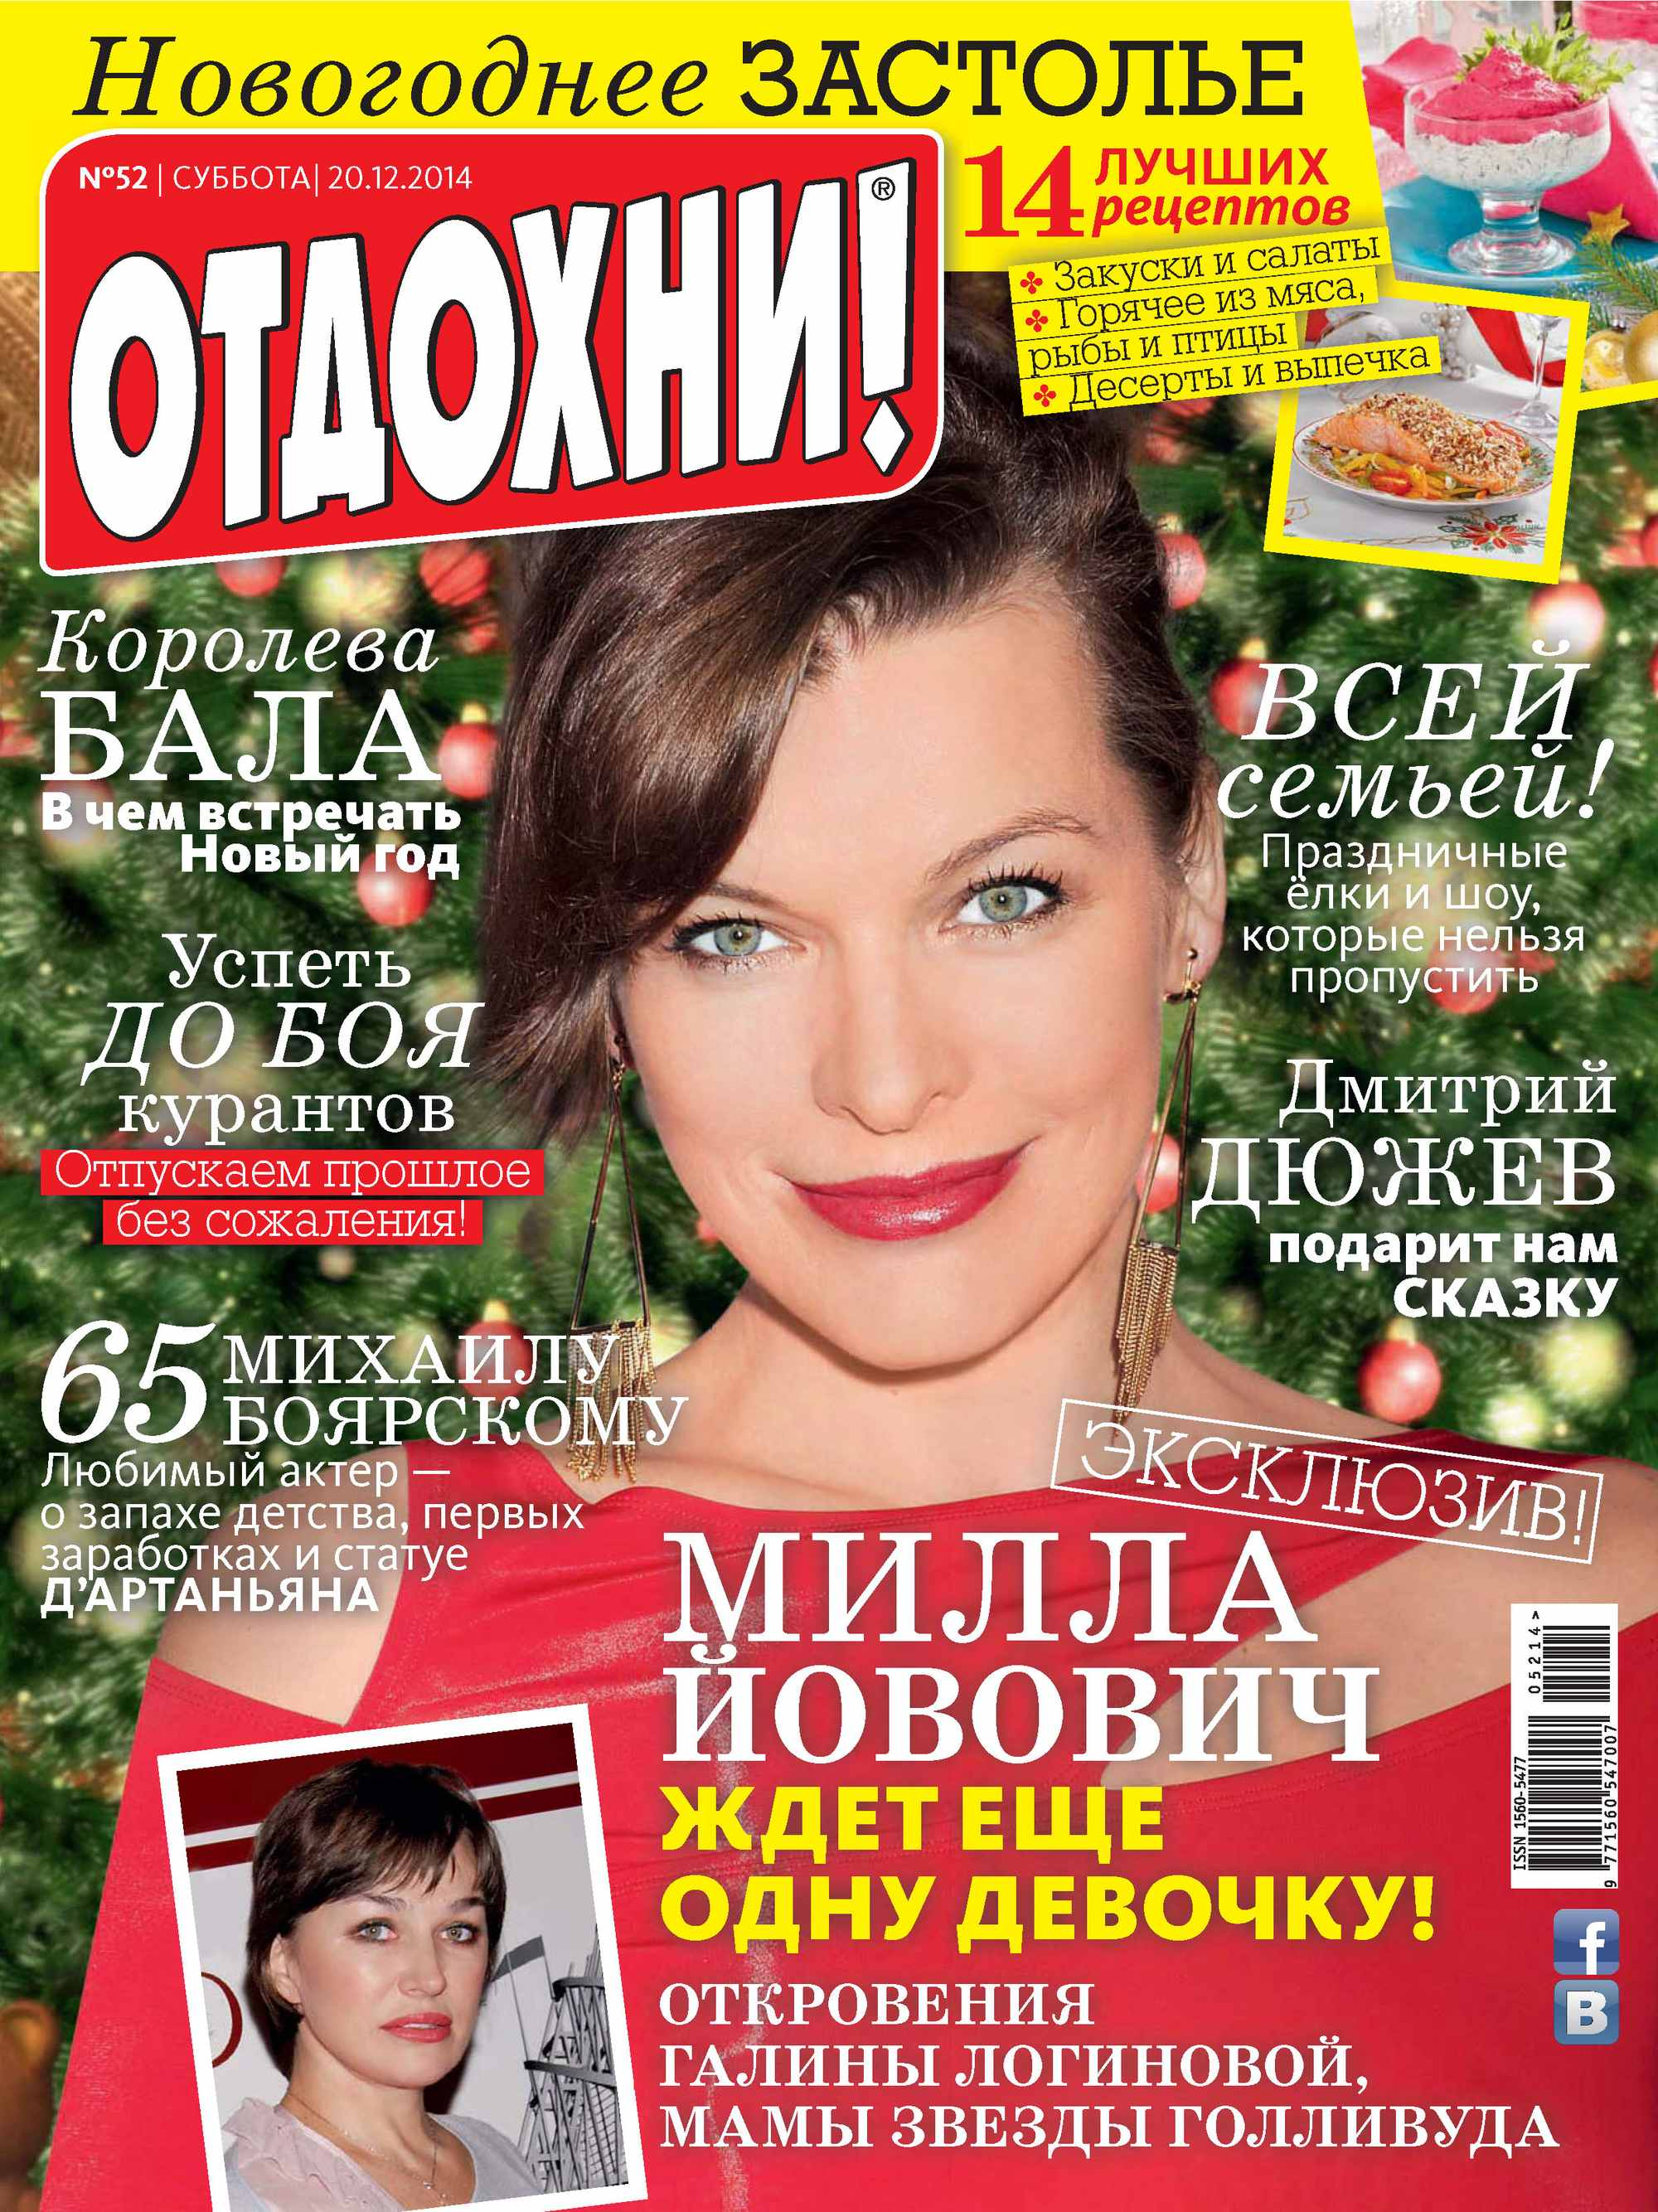 ИД «Бурда» Журнал «Отдохни!» №52/2014 ид бурда журнал отдохни 33 2014